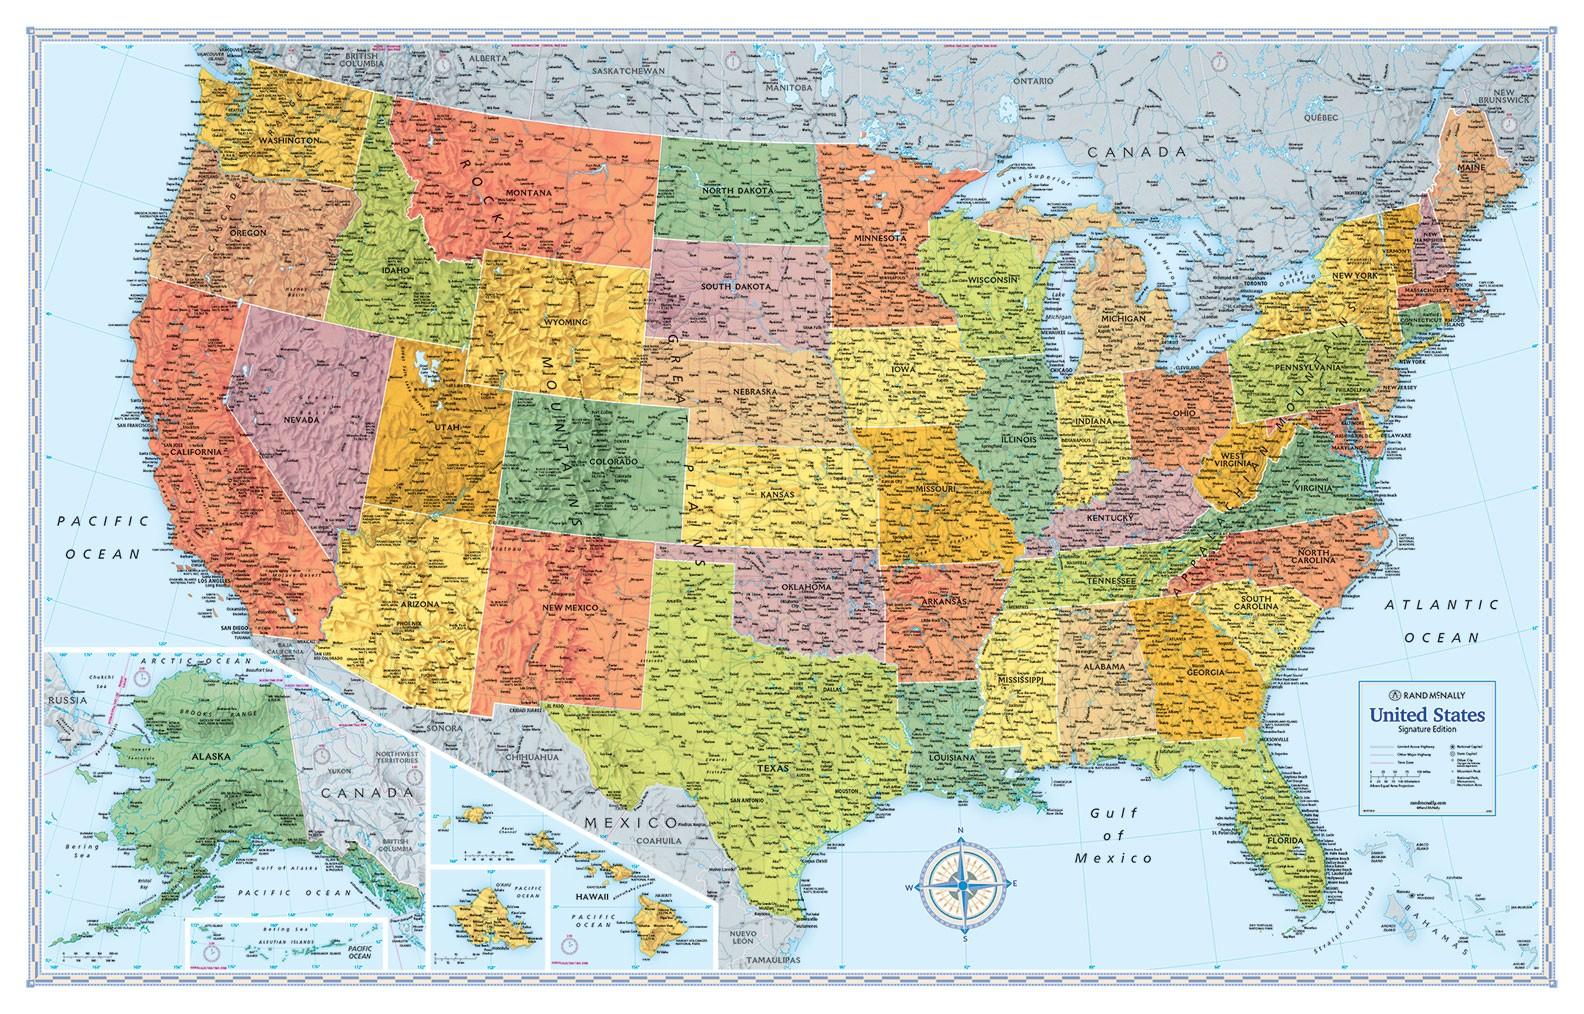 Rand McNally Signature Map of the U.S.